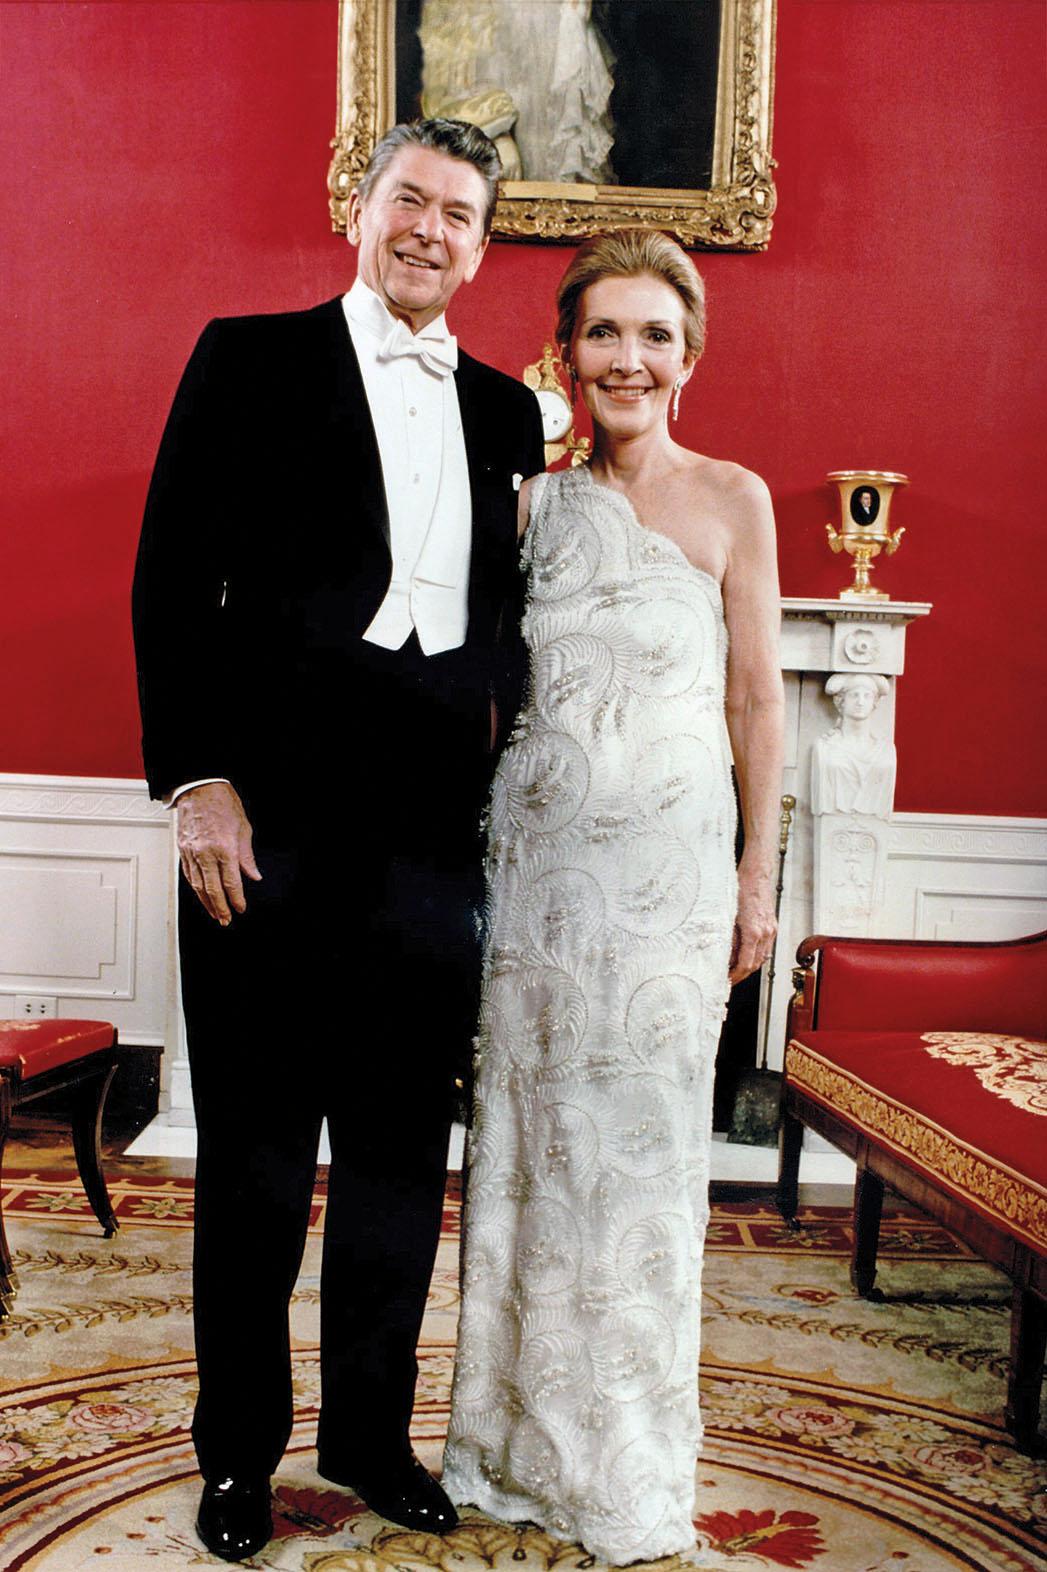 Ronald Reagan and Nancy Reagan - REX - P 2016